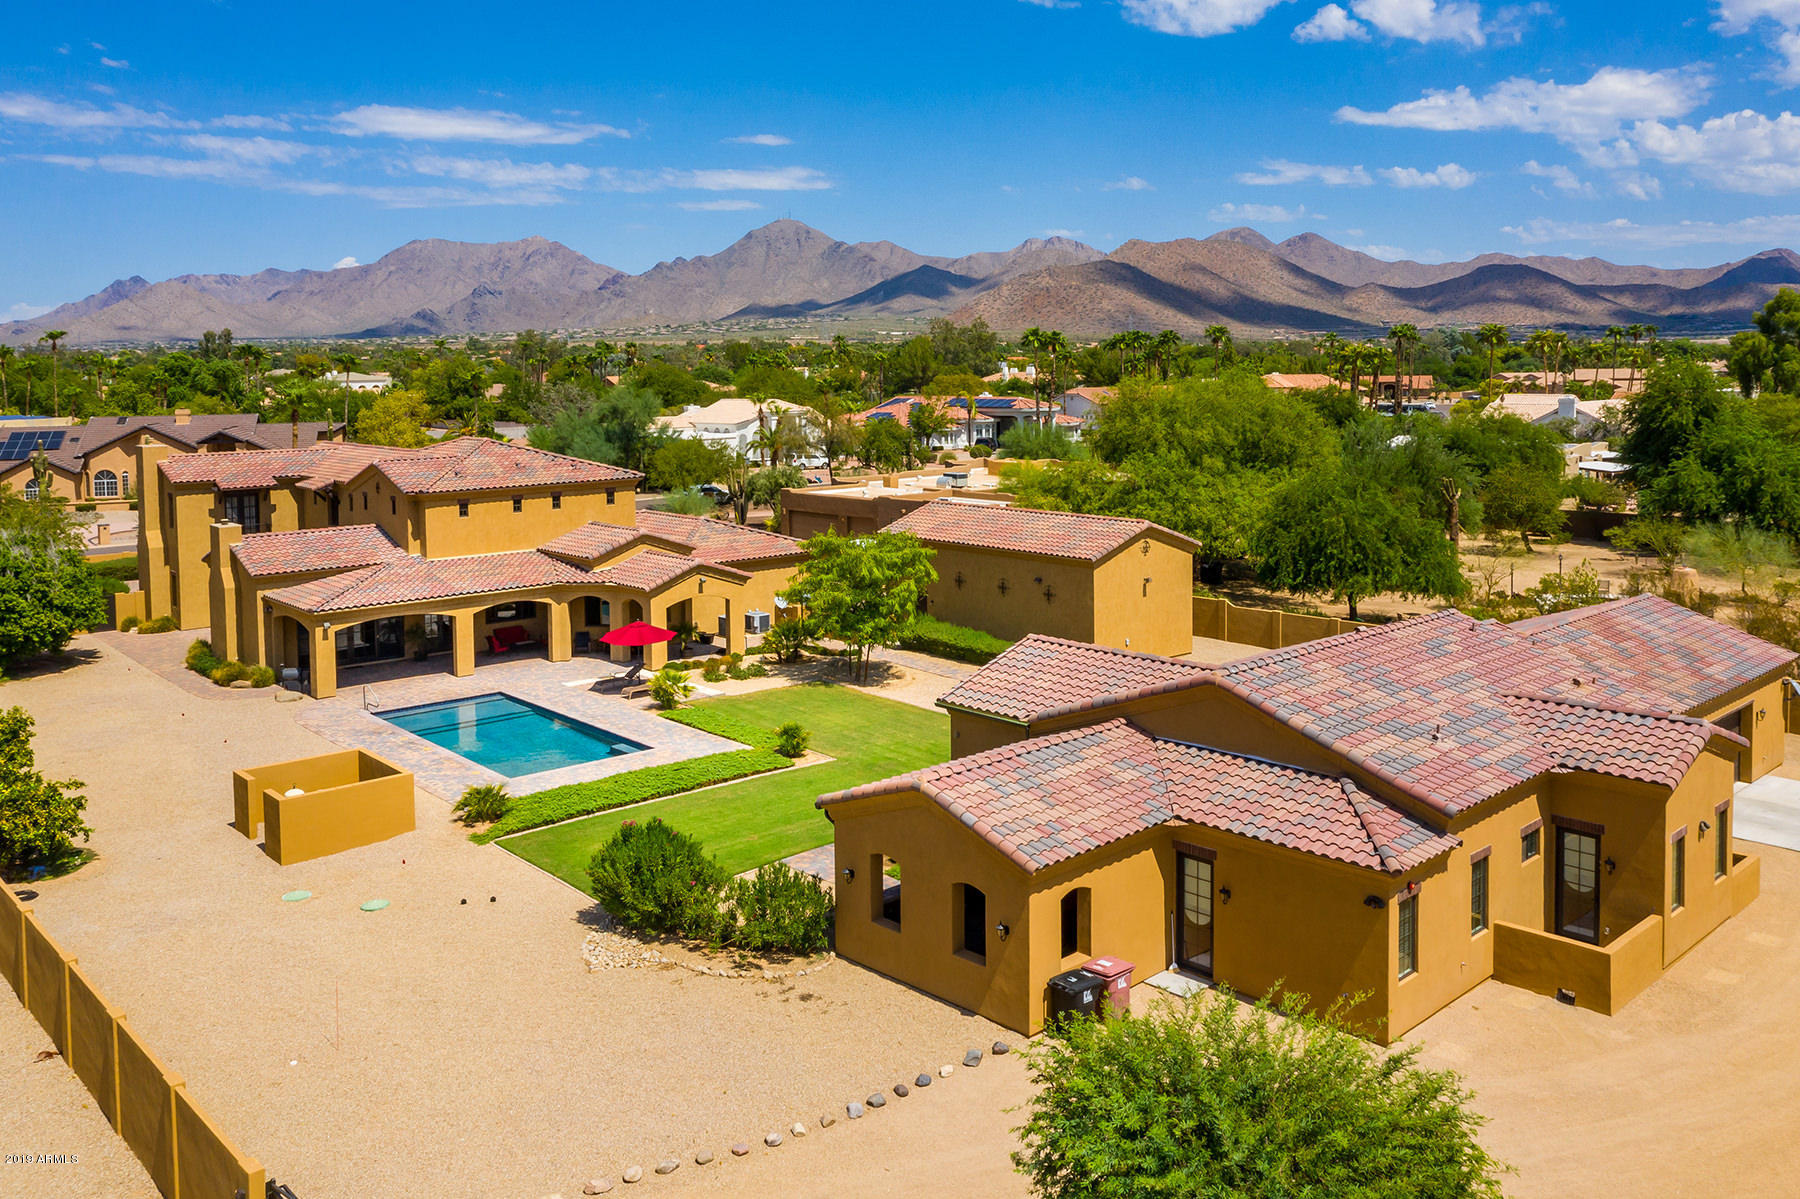 10125 E Cortez Dr Scottsdale, AZ